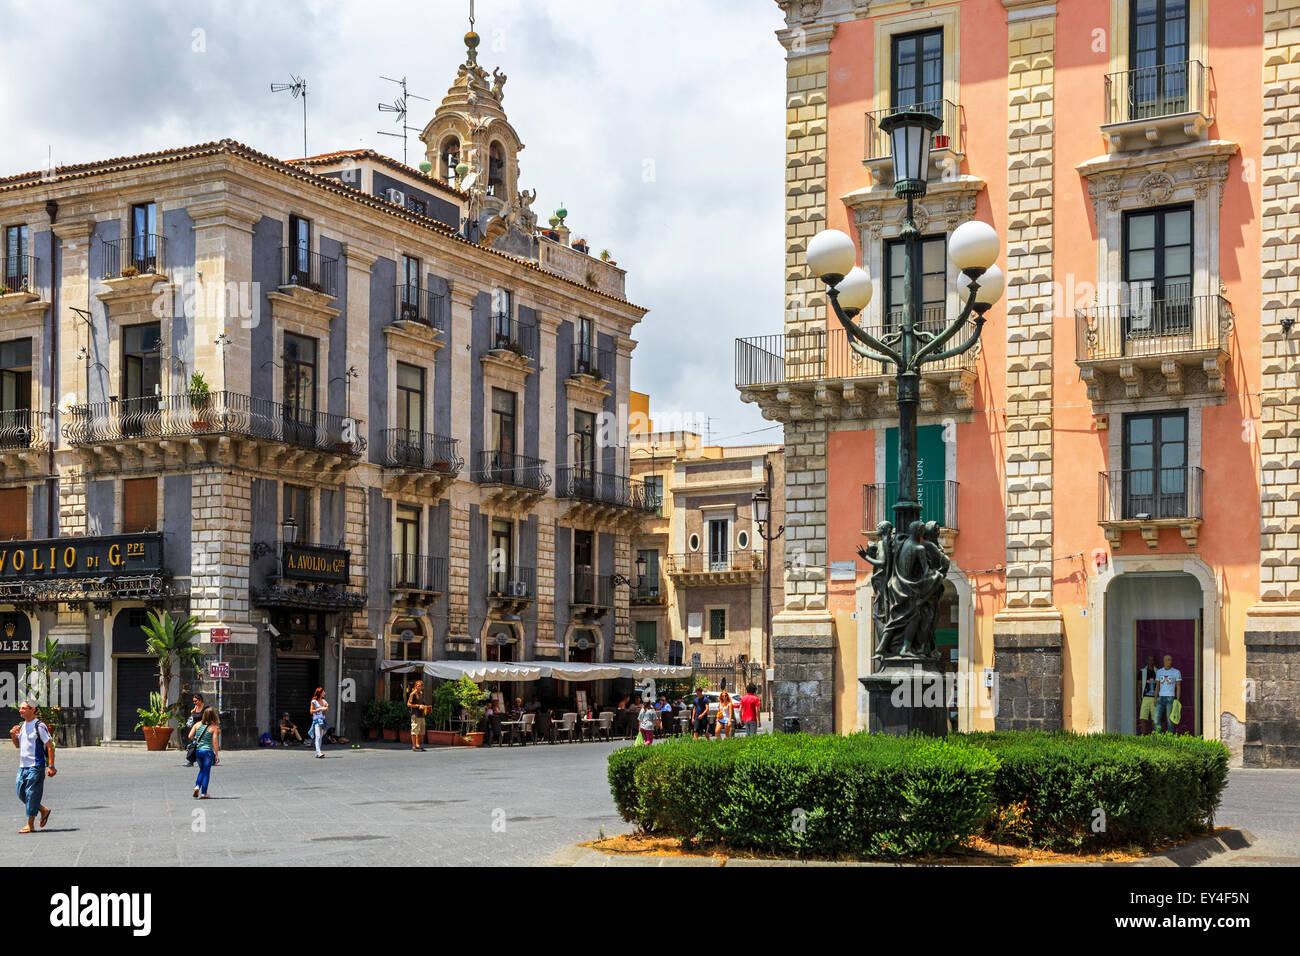 Palazzo la Piana, Via Etnea, pedestrian precinct, Catania, Sicily, Italy - Stock Image